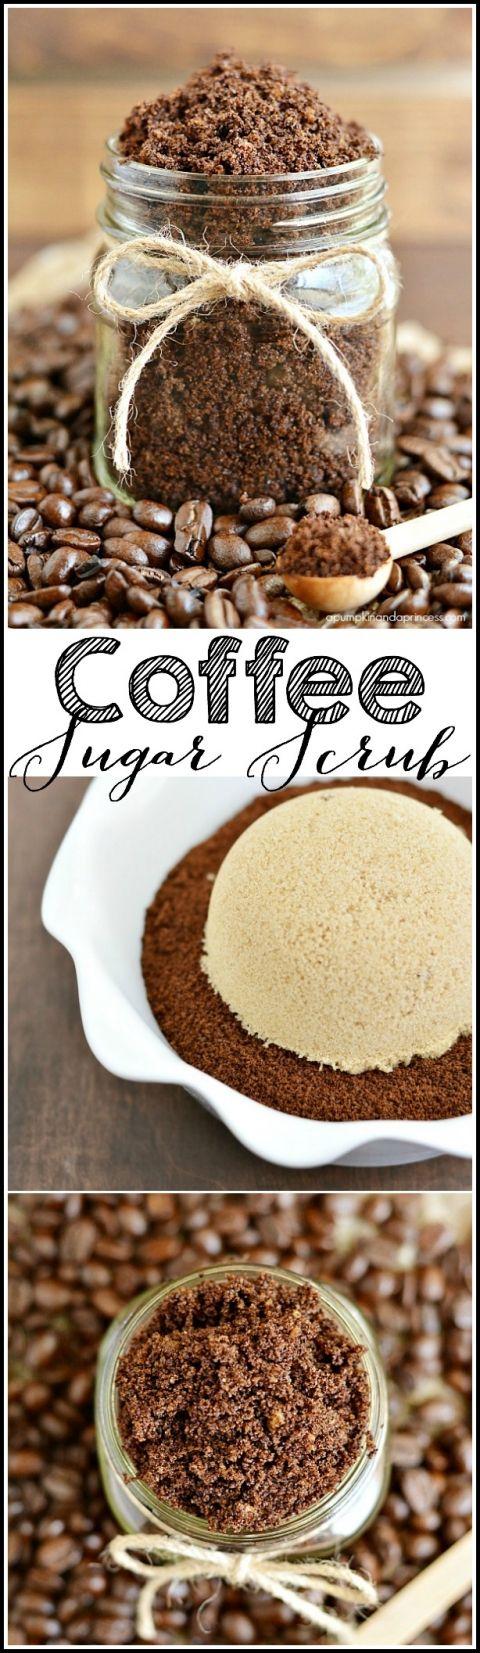 DIY Coffee Sugar Scrub - skin nourishing oils and a blend of coffee & sugar help exfoliate dry skin. Great handmade Christmas gift idea!